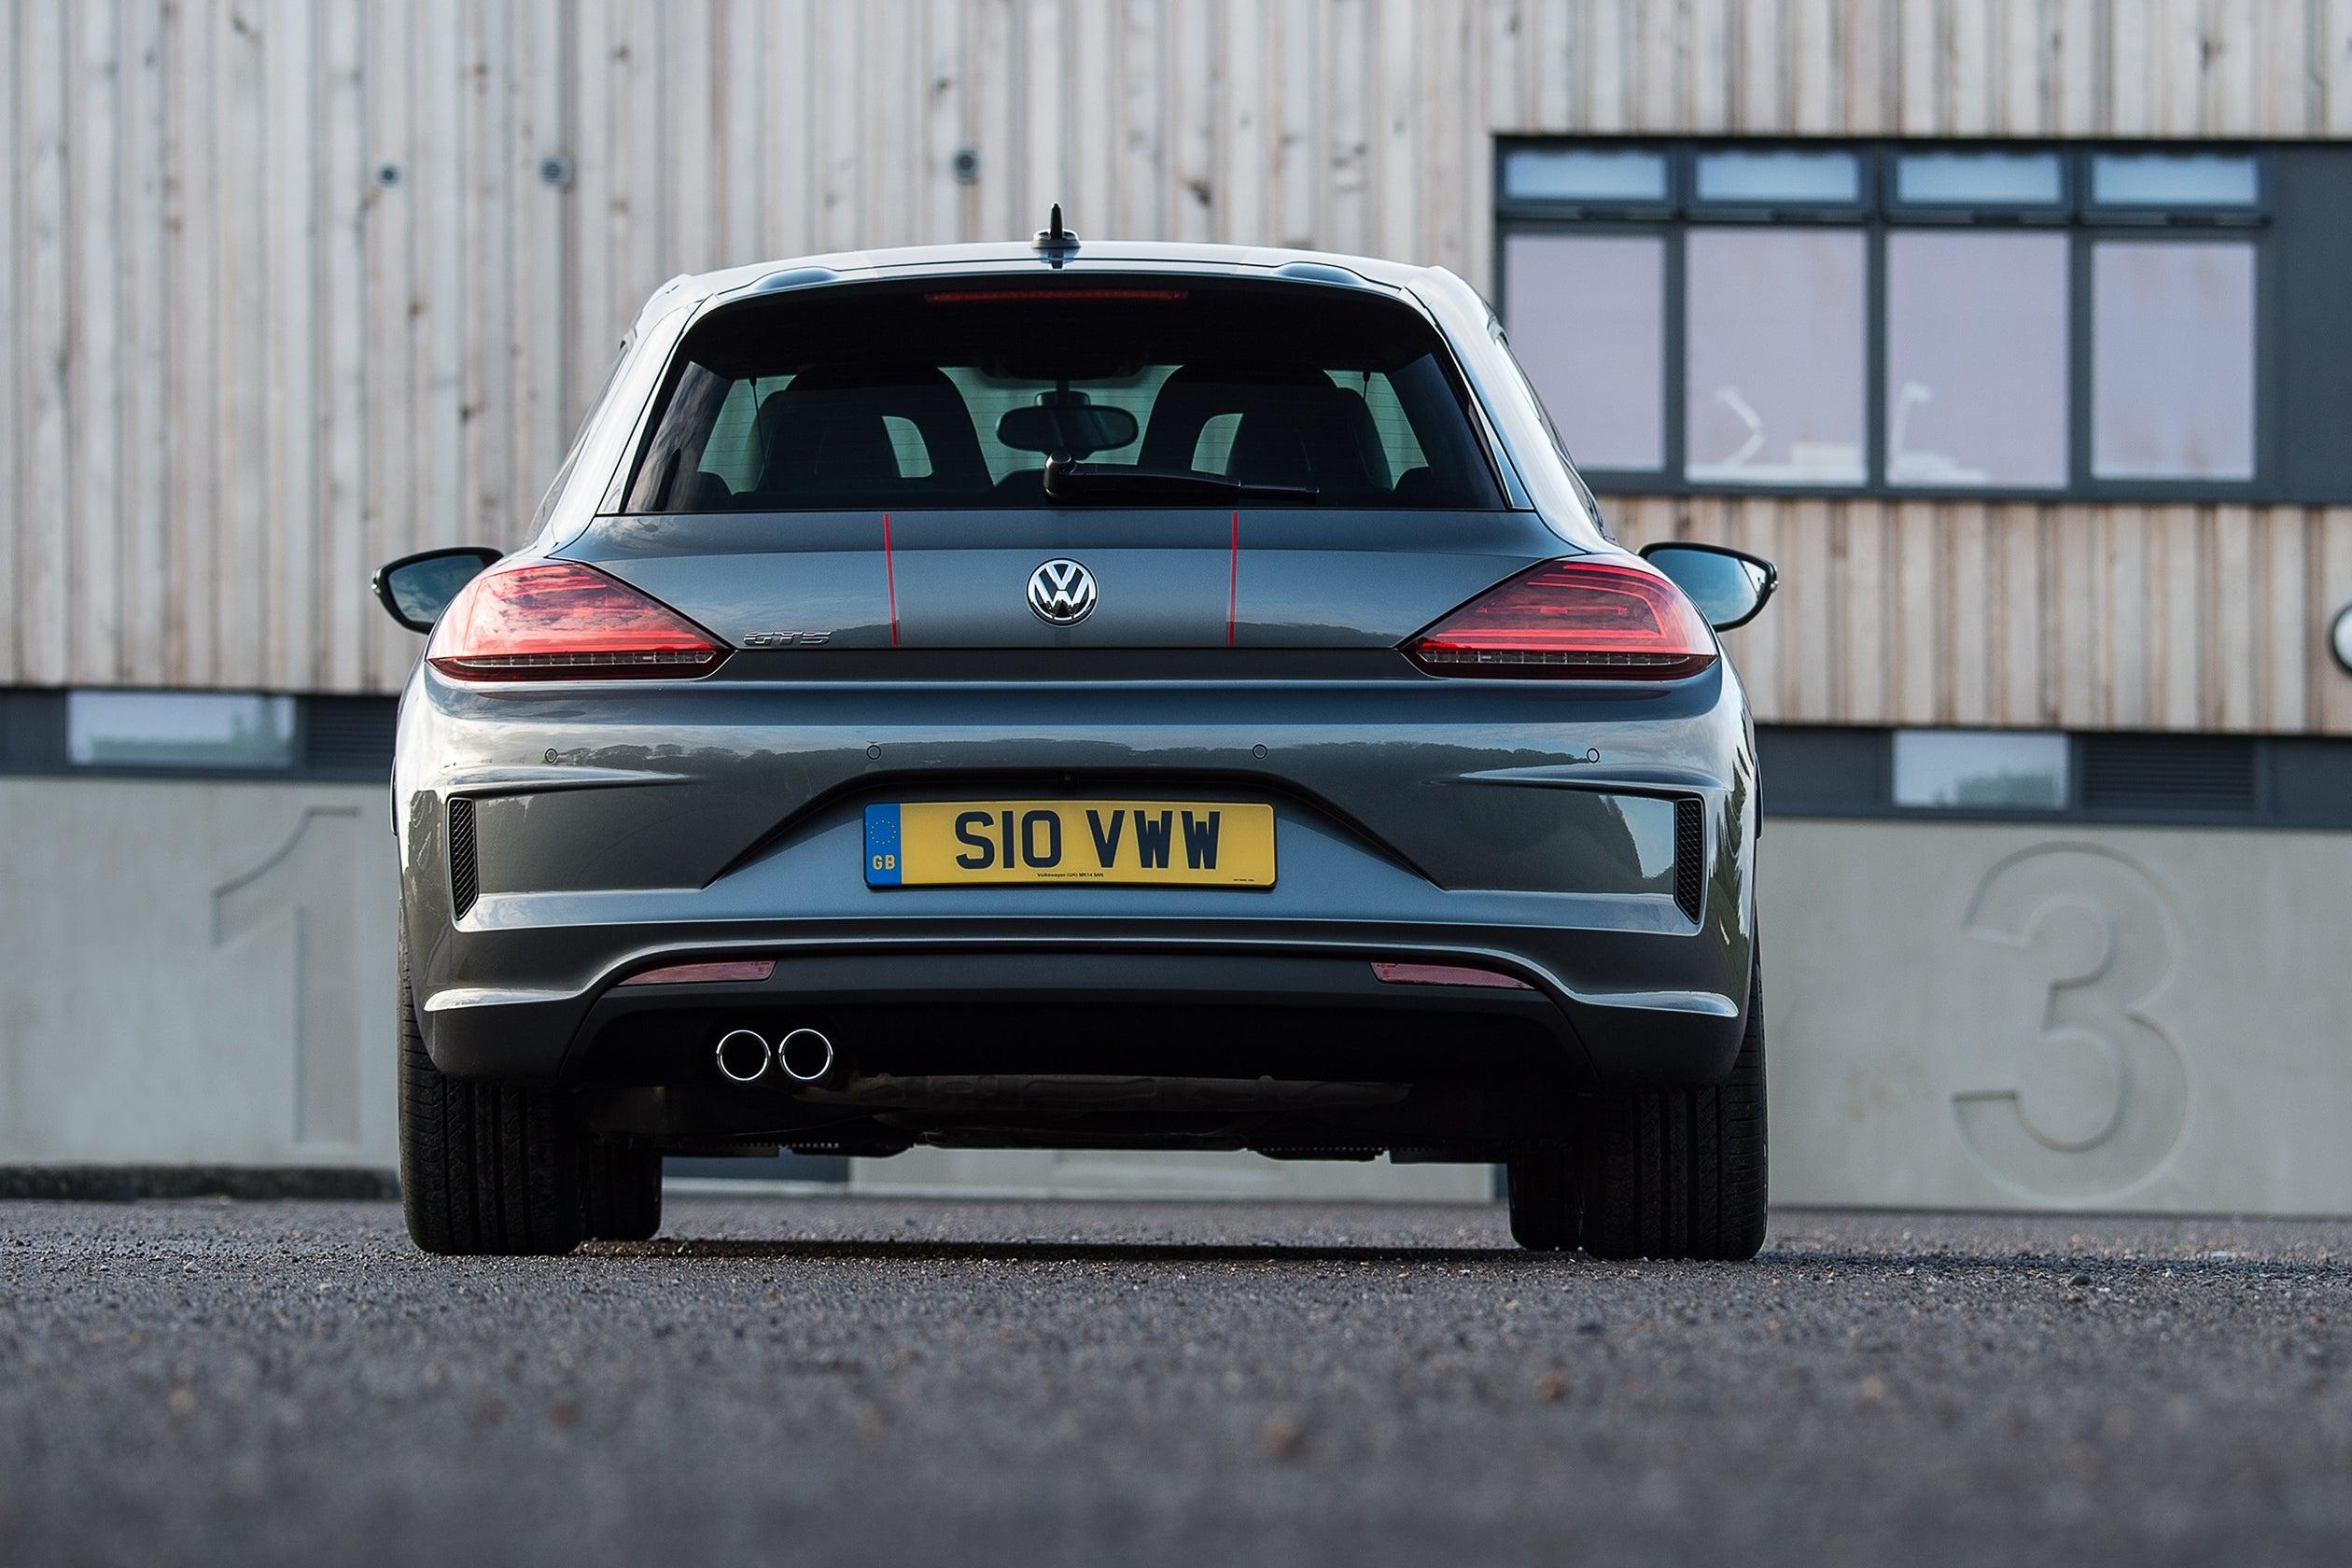 Volkswagen Scirocco Rear View